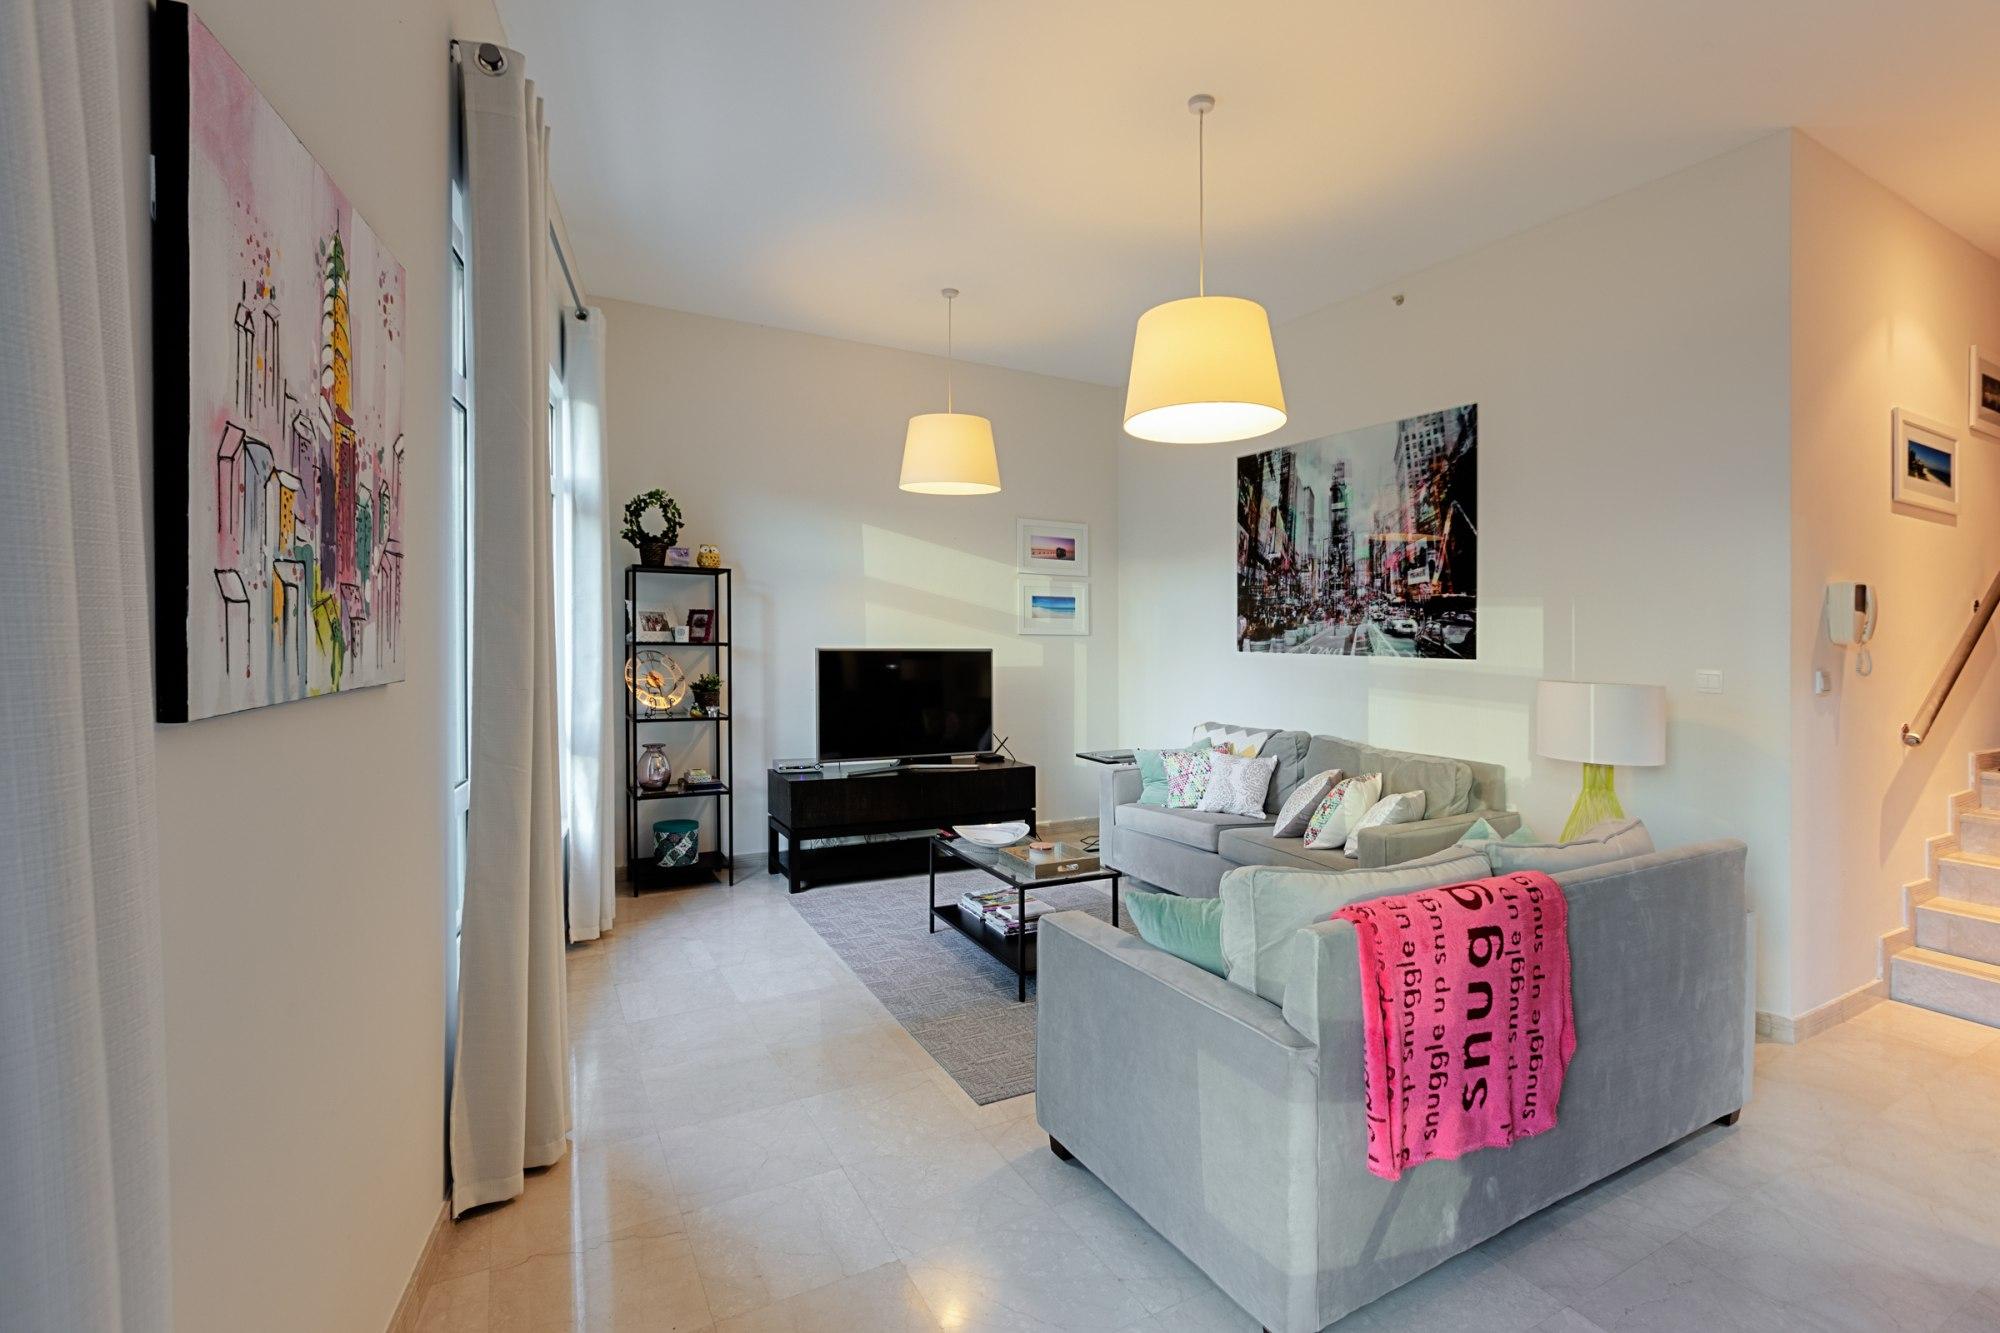 1 Bedroom Podium Villa in The Residences